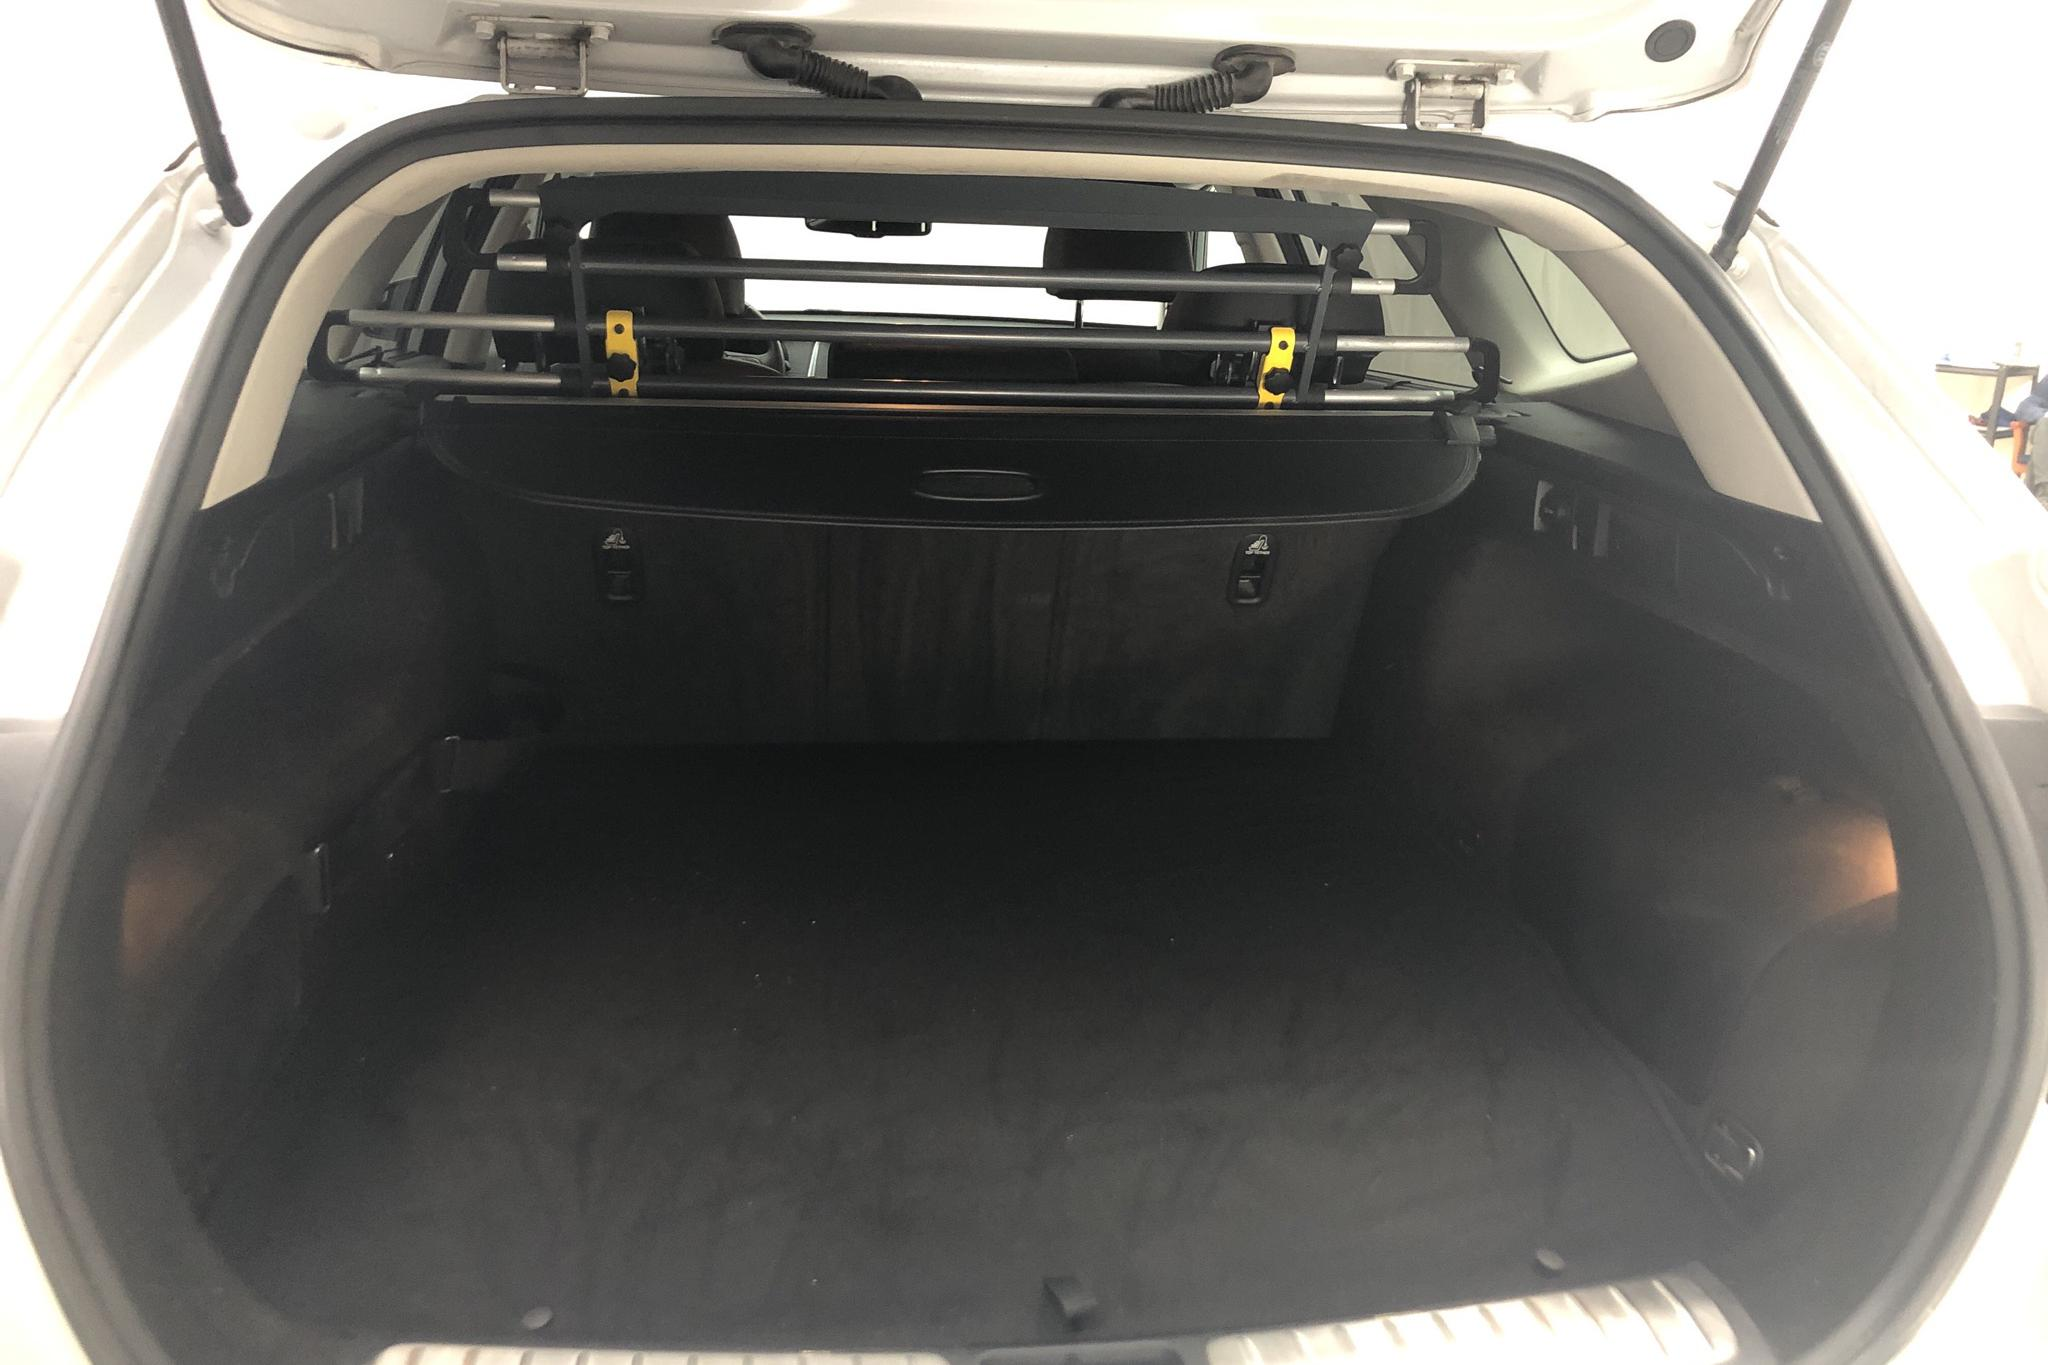 KIA Optima 2.0 GDi Plug-in Hybrid SW (205hk) - 9 268 mil - Automat - grå - 2018